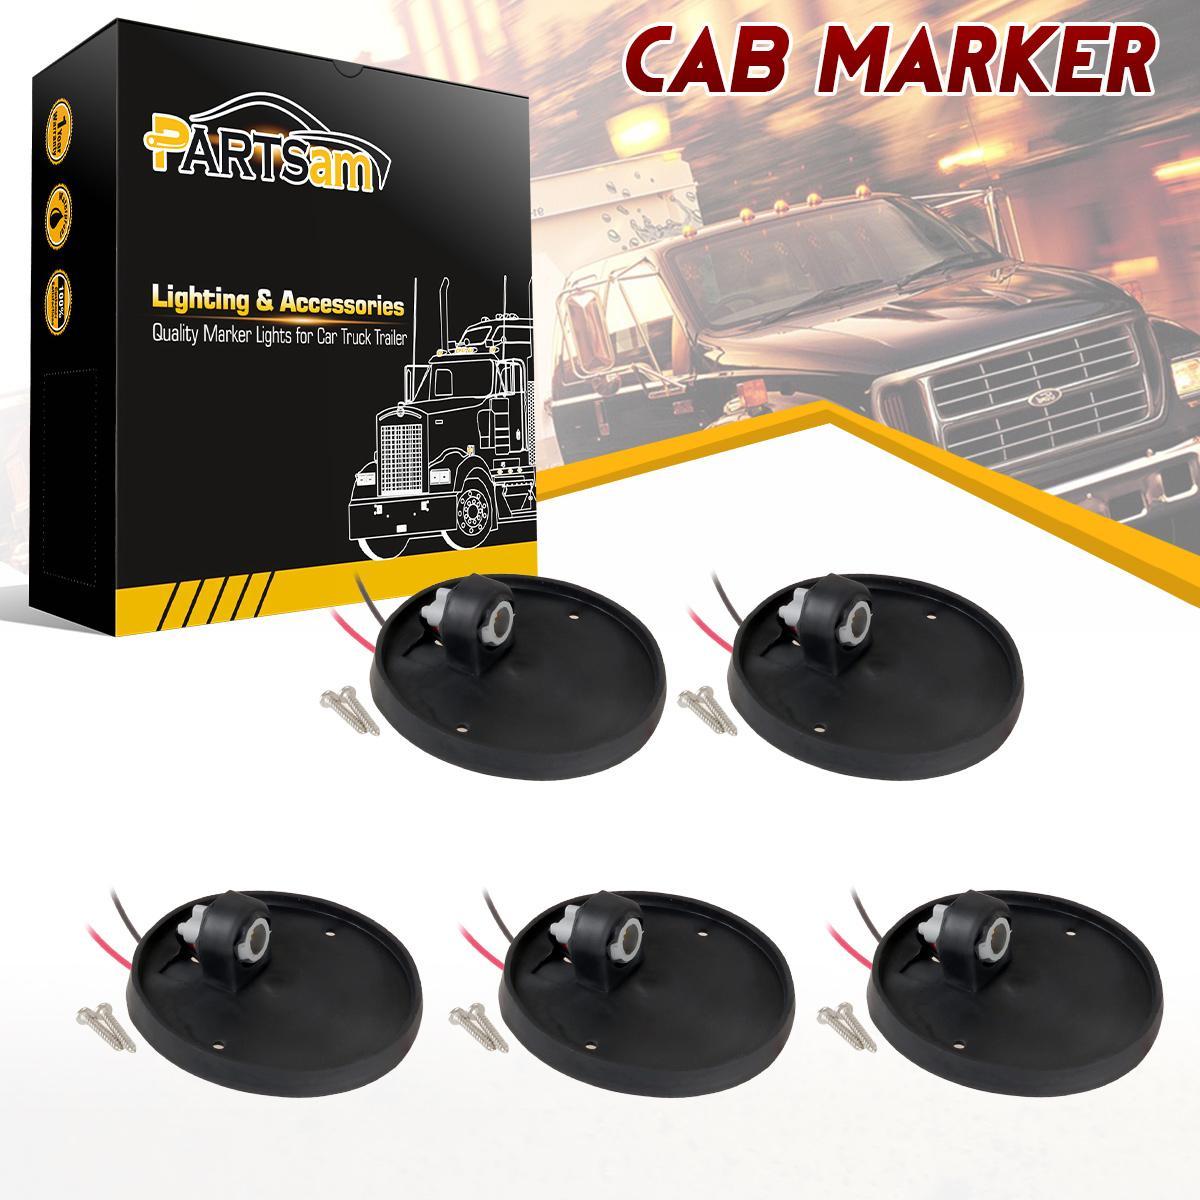 Qty 5 Truck Lite Cab Marker Rubber Base For Chevrolet C K